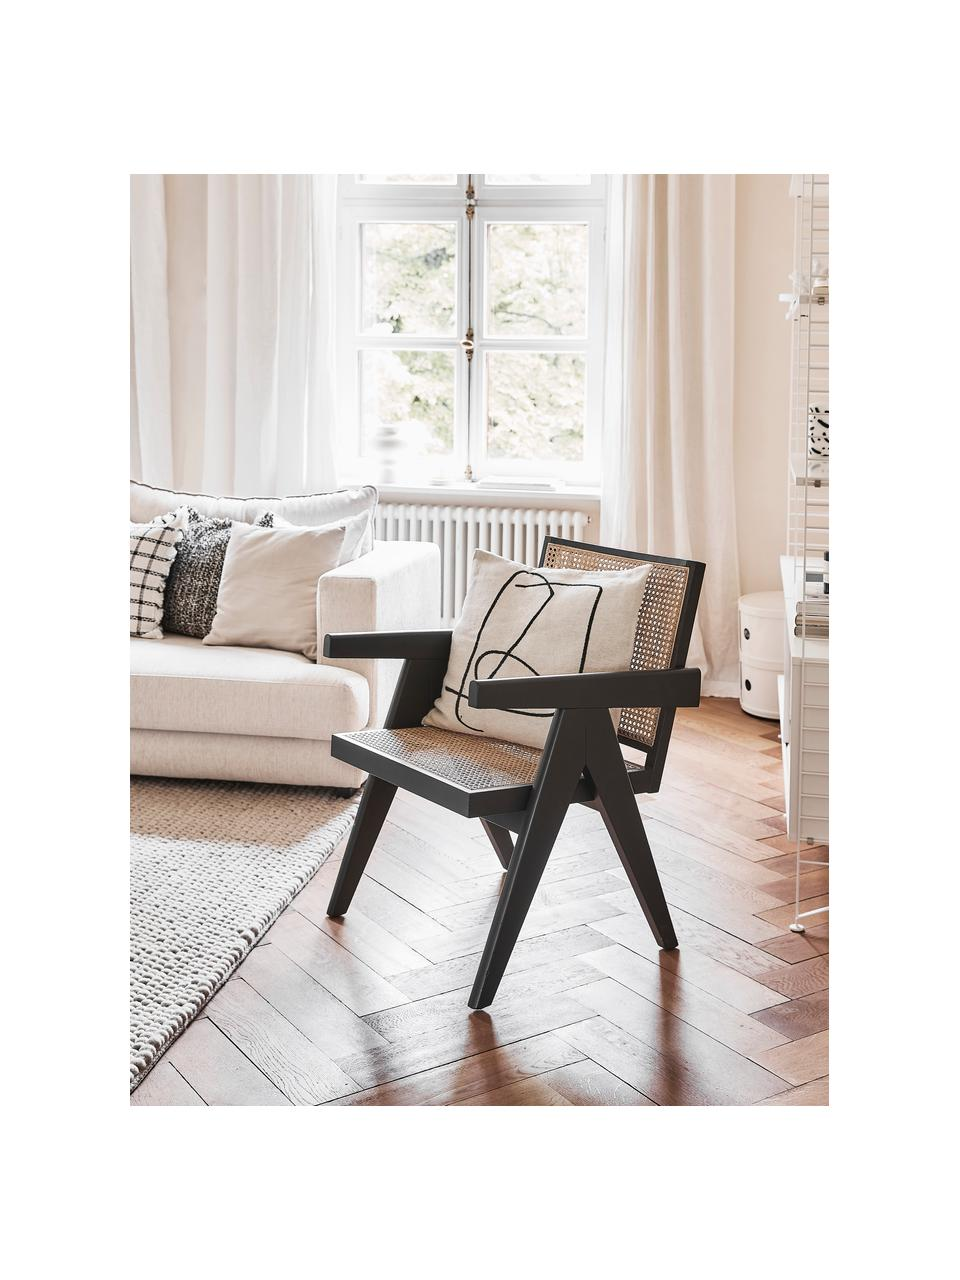 Loungesessel Sissi mit Wiener Geflecht, Gestell: Massives Buchenholz, lack, Sitzfläche: Rattan, Buchenholz, B 58 x T 66 cm